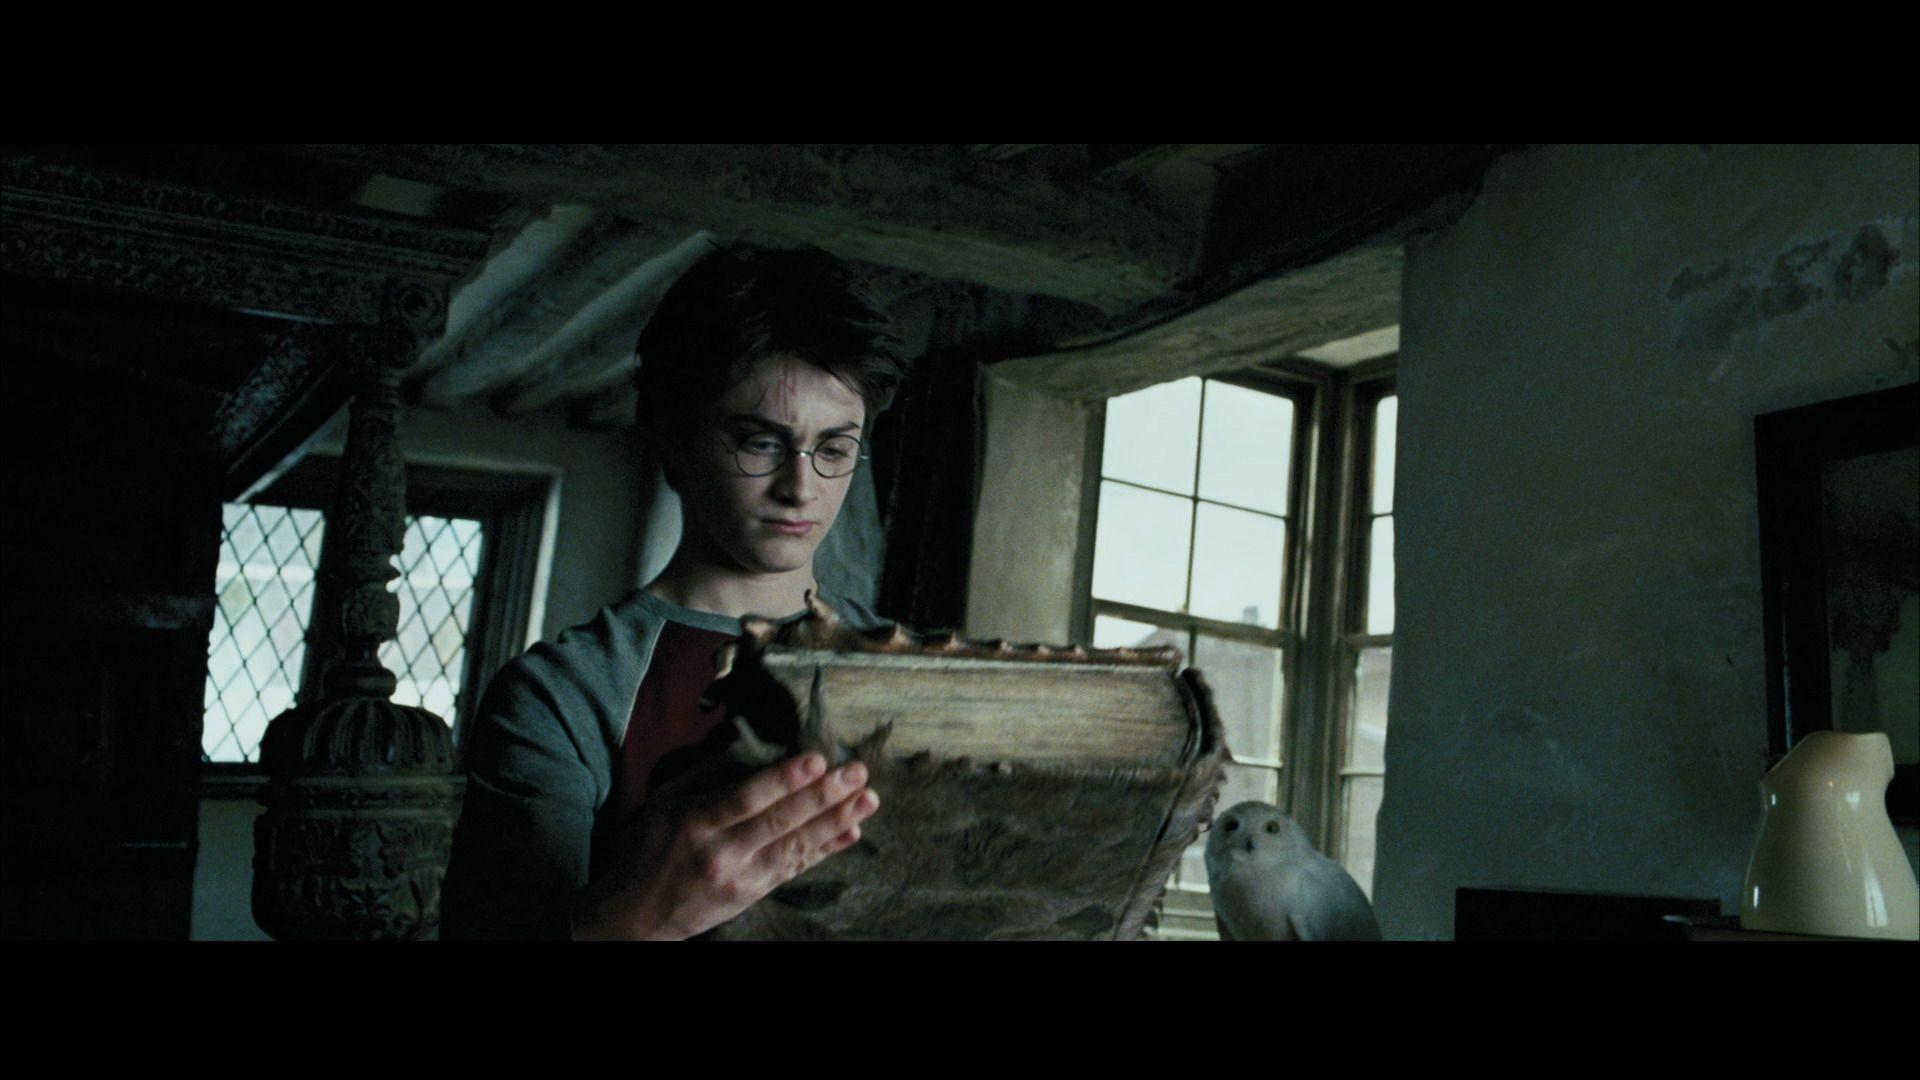 Harry Potter And The Prisoner Of Azkaban 2004 Movie Screencaps Com Prisoner Of Azkaban Harry Potter Pictures Azkaban